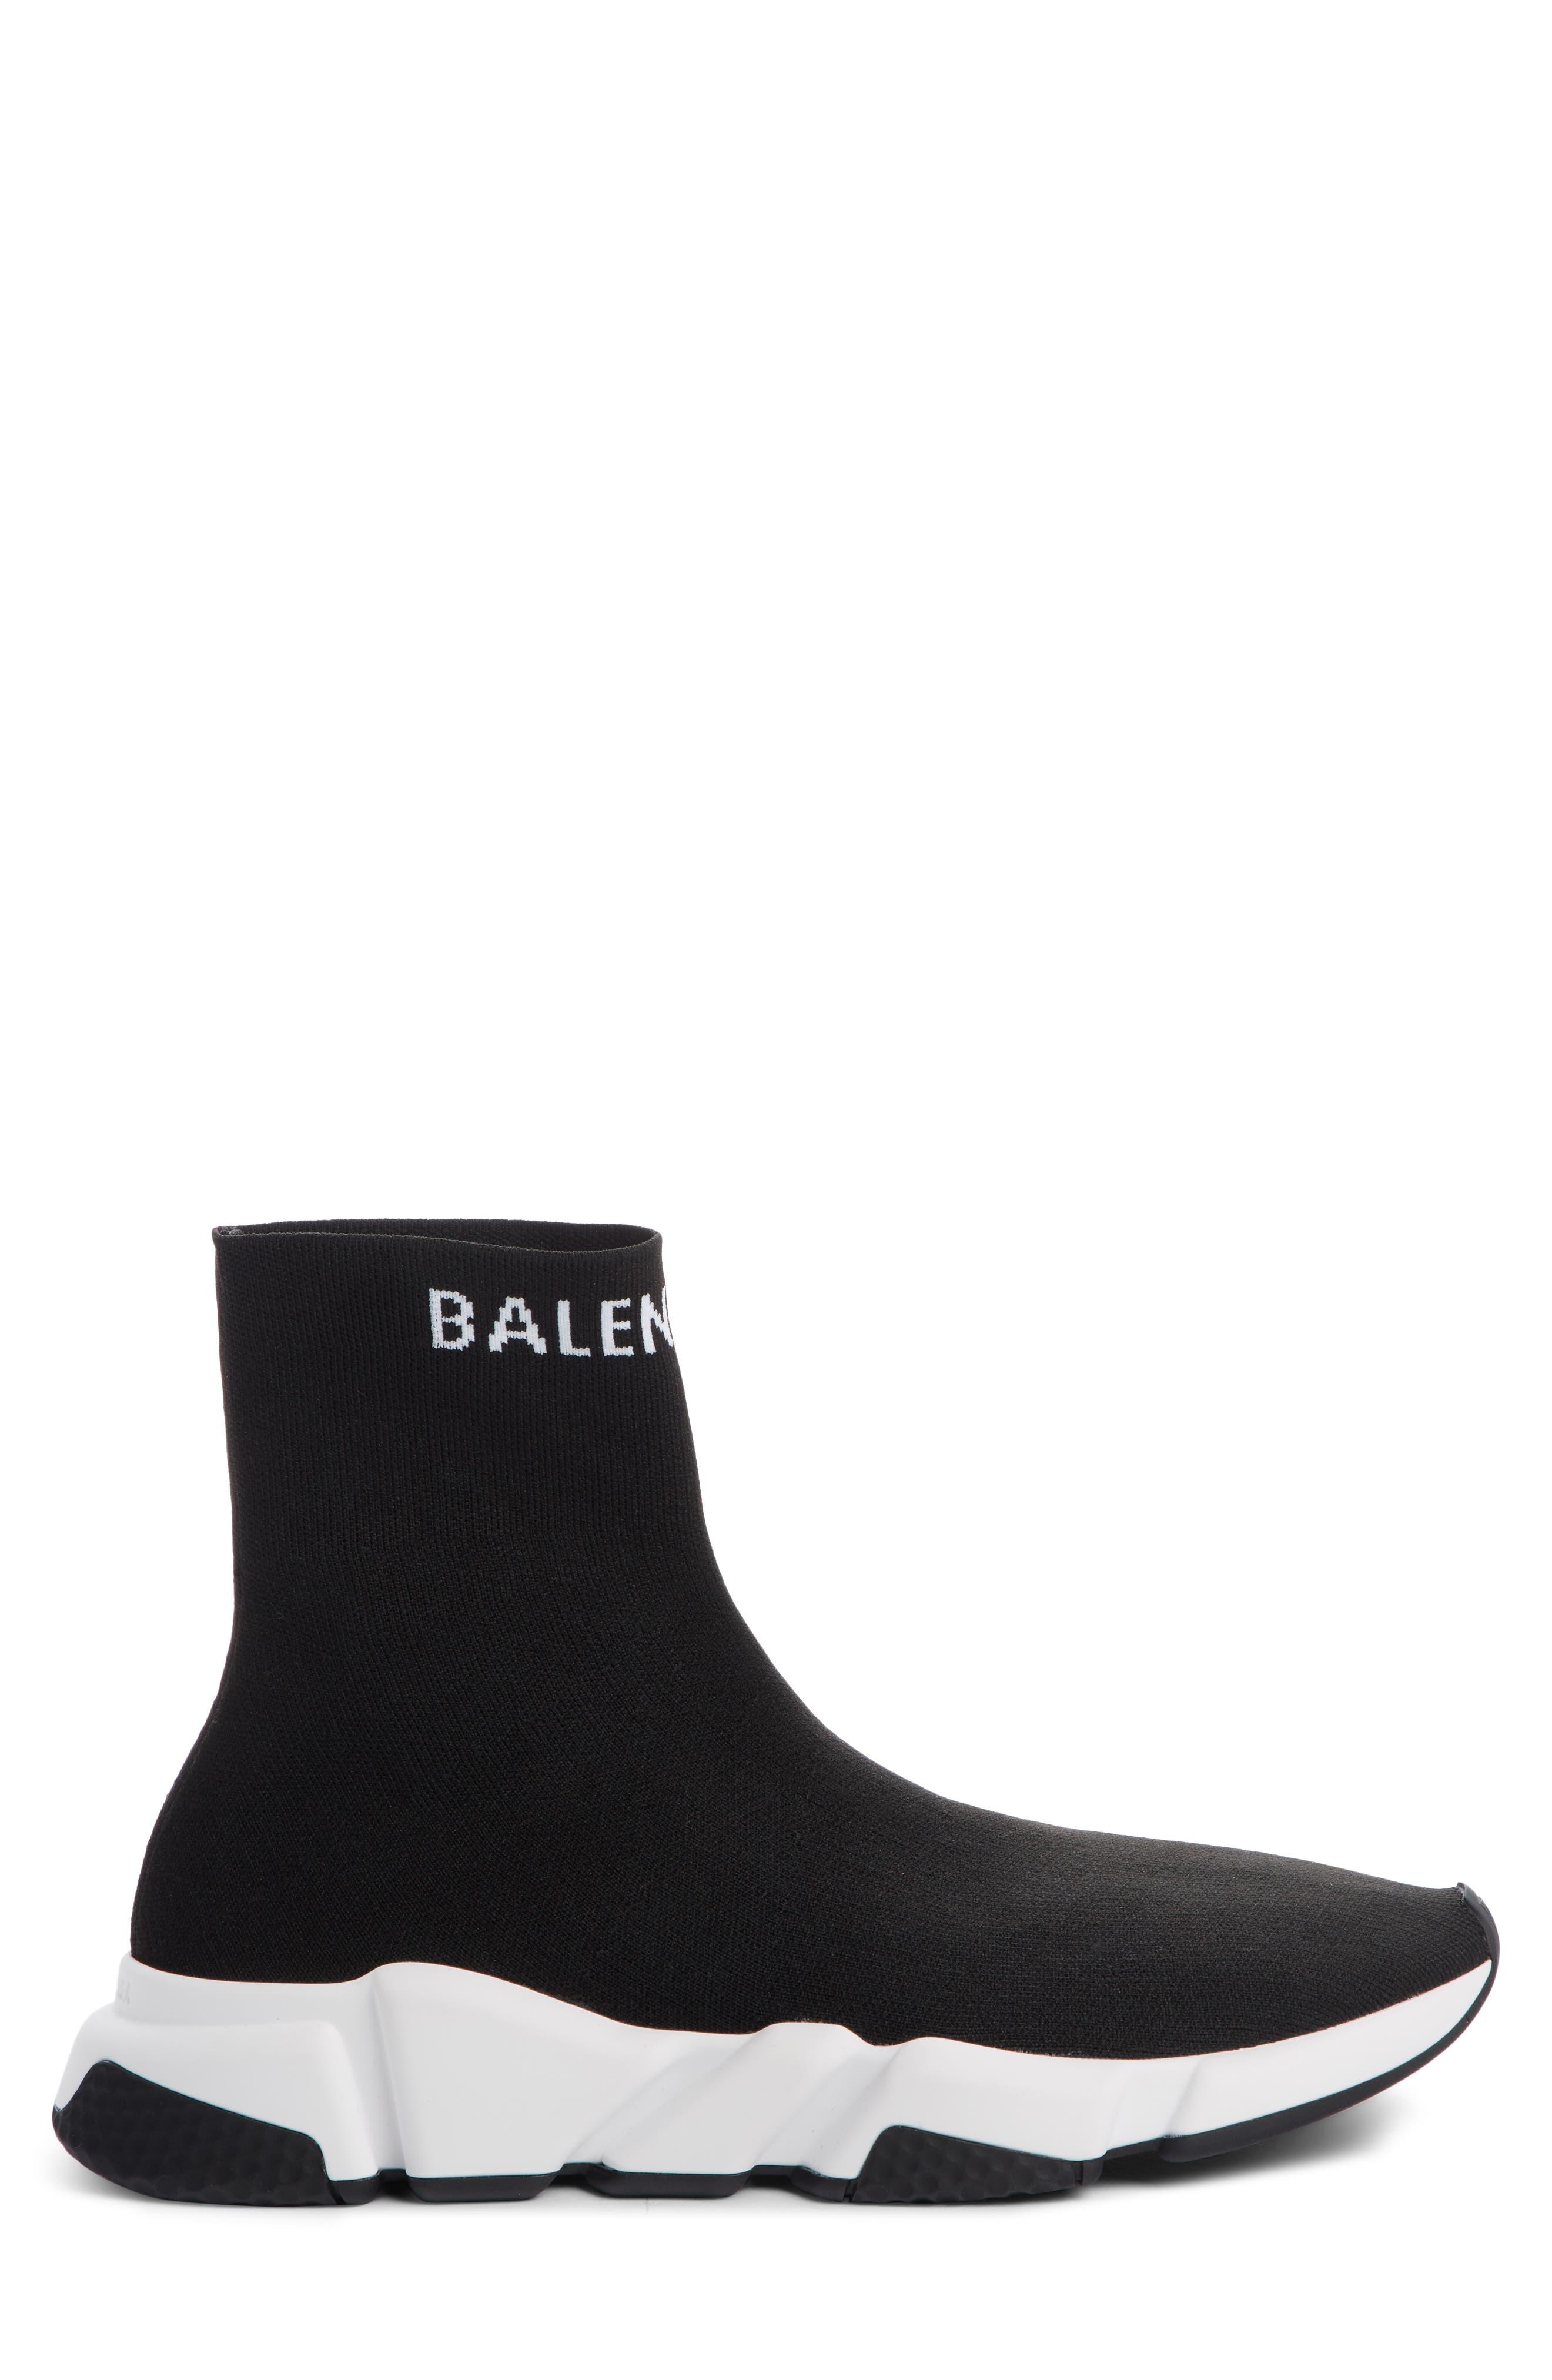 BALENCIAGA, Speed Sock Slip-On, Alternate thumbnail 3, color, BLACK/ WHITE